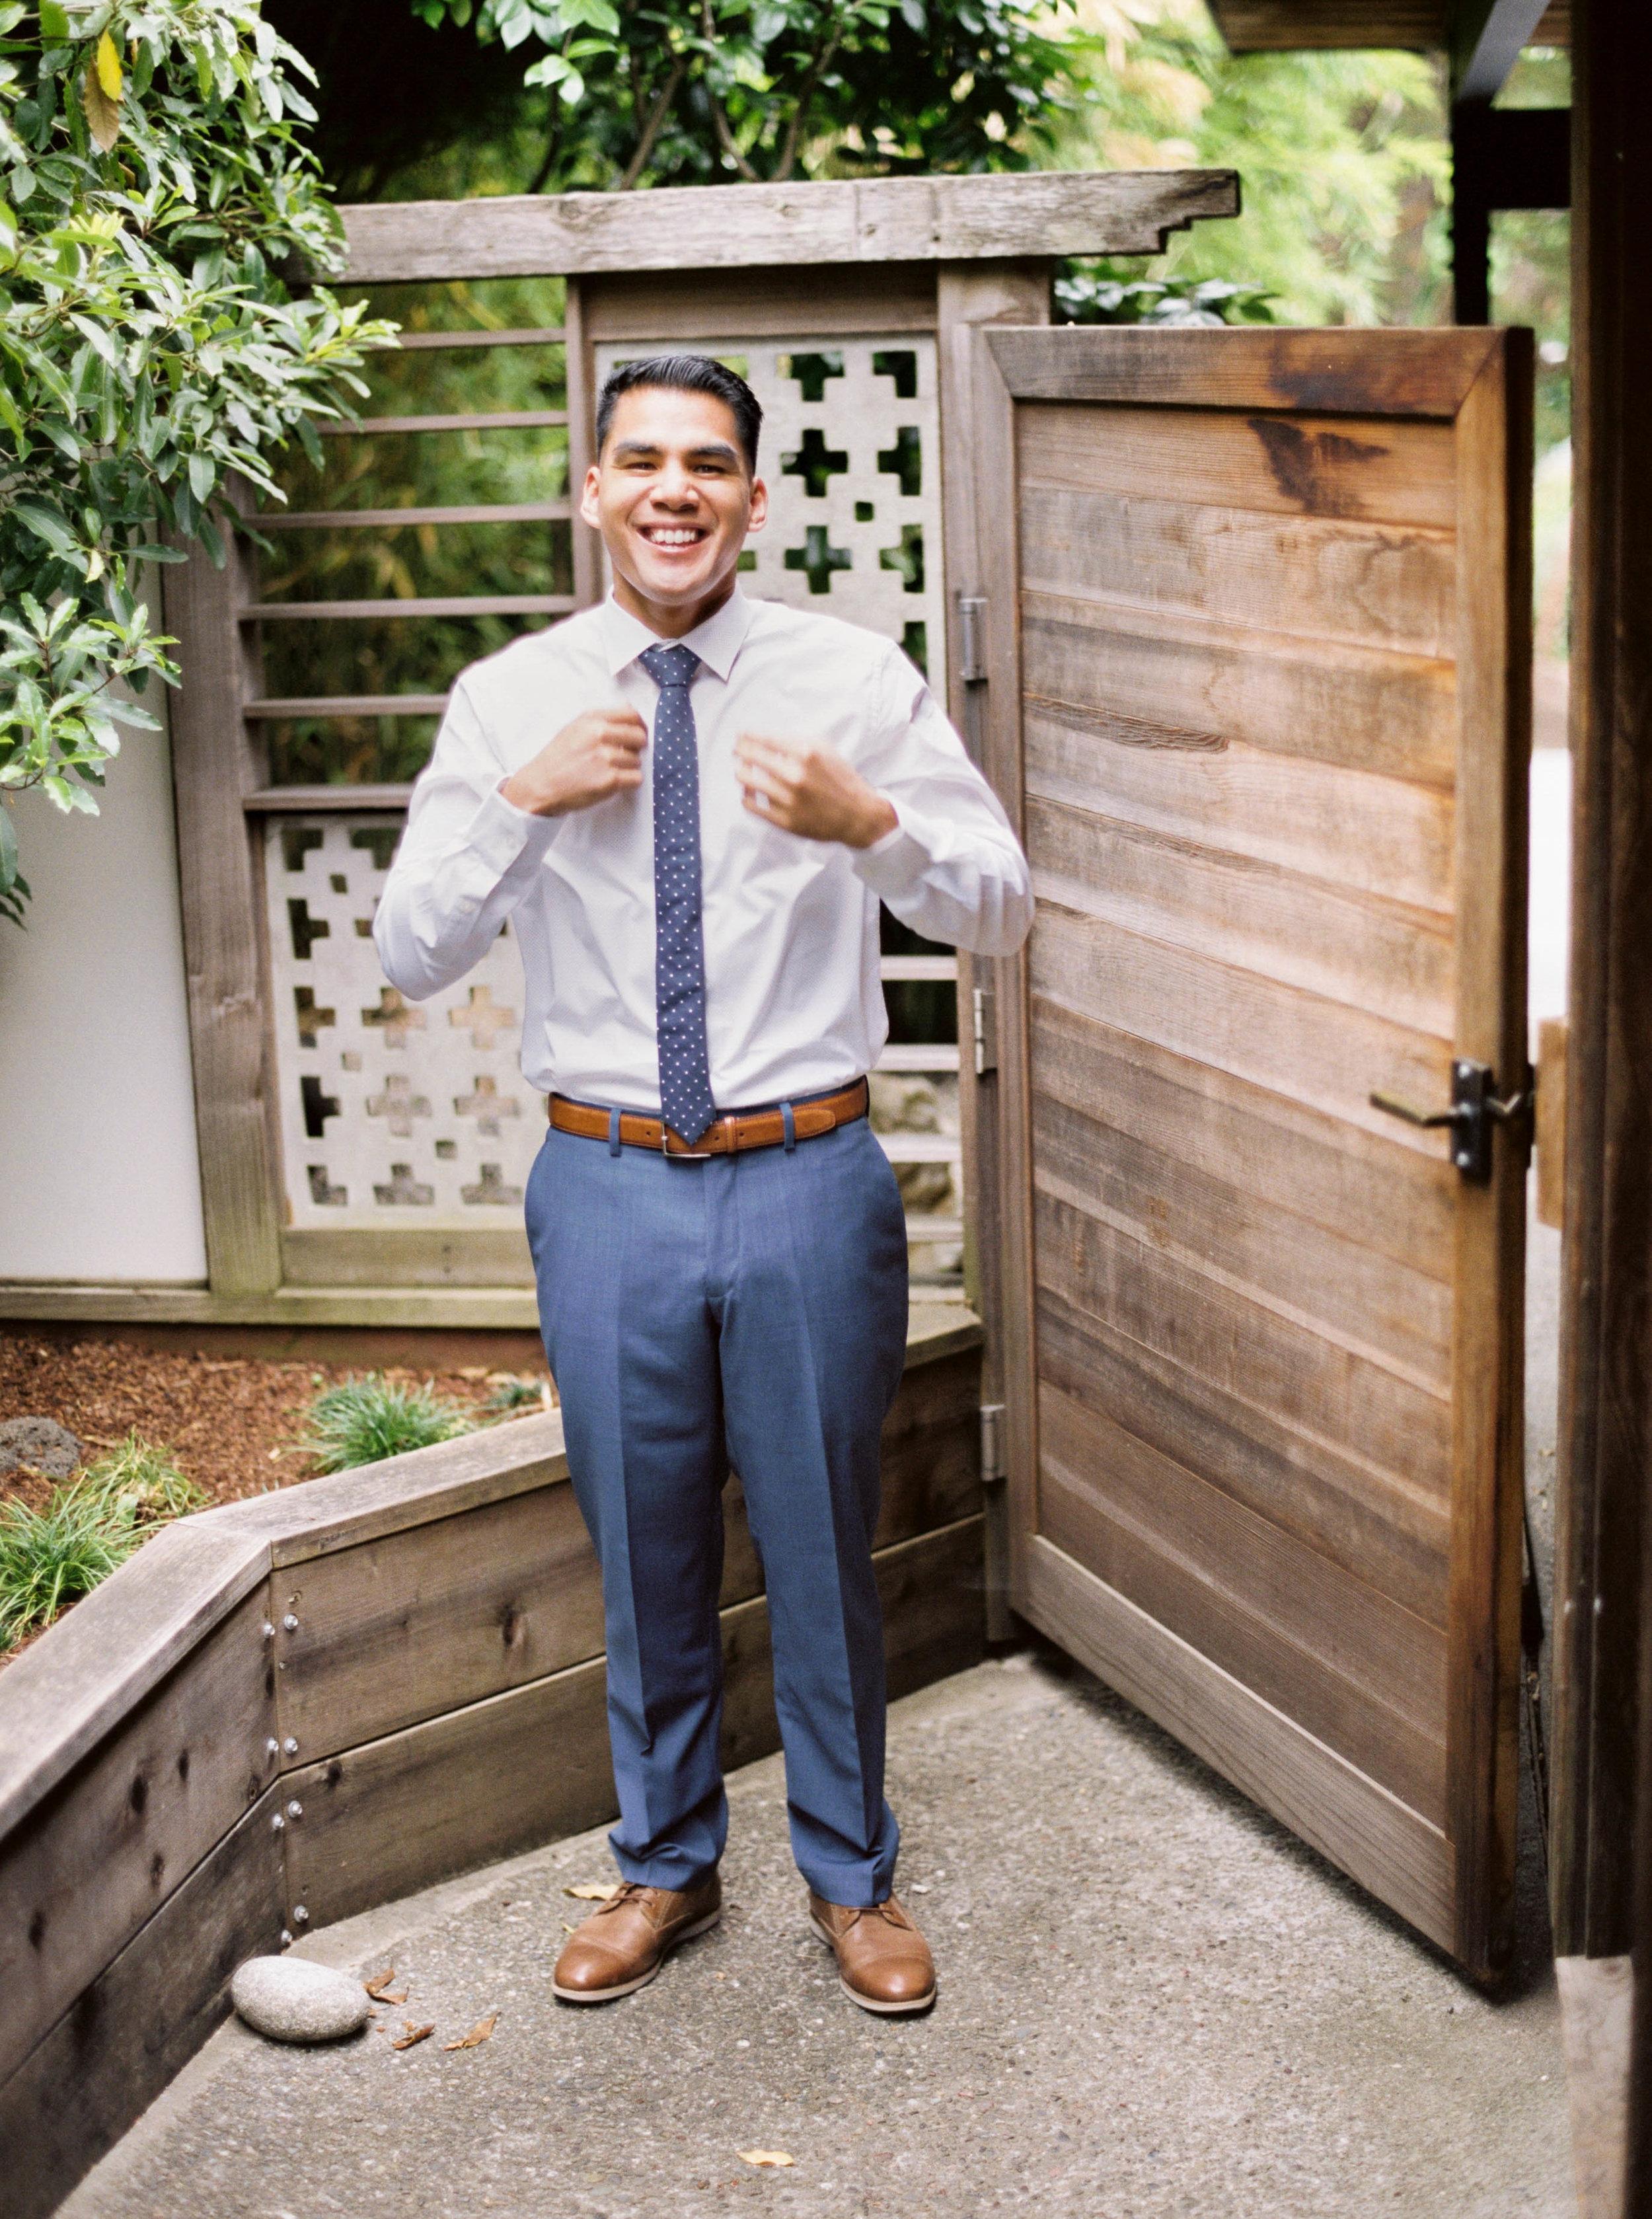 010_Krysten-Crebin-Bay-Area-Elopement-Wedding-Photographer-Videographer.jpg